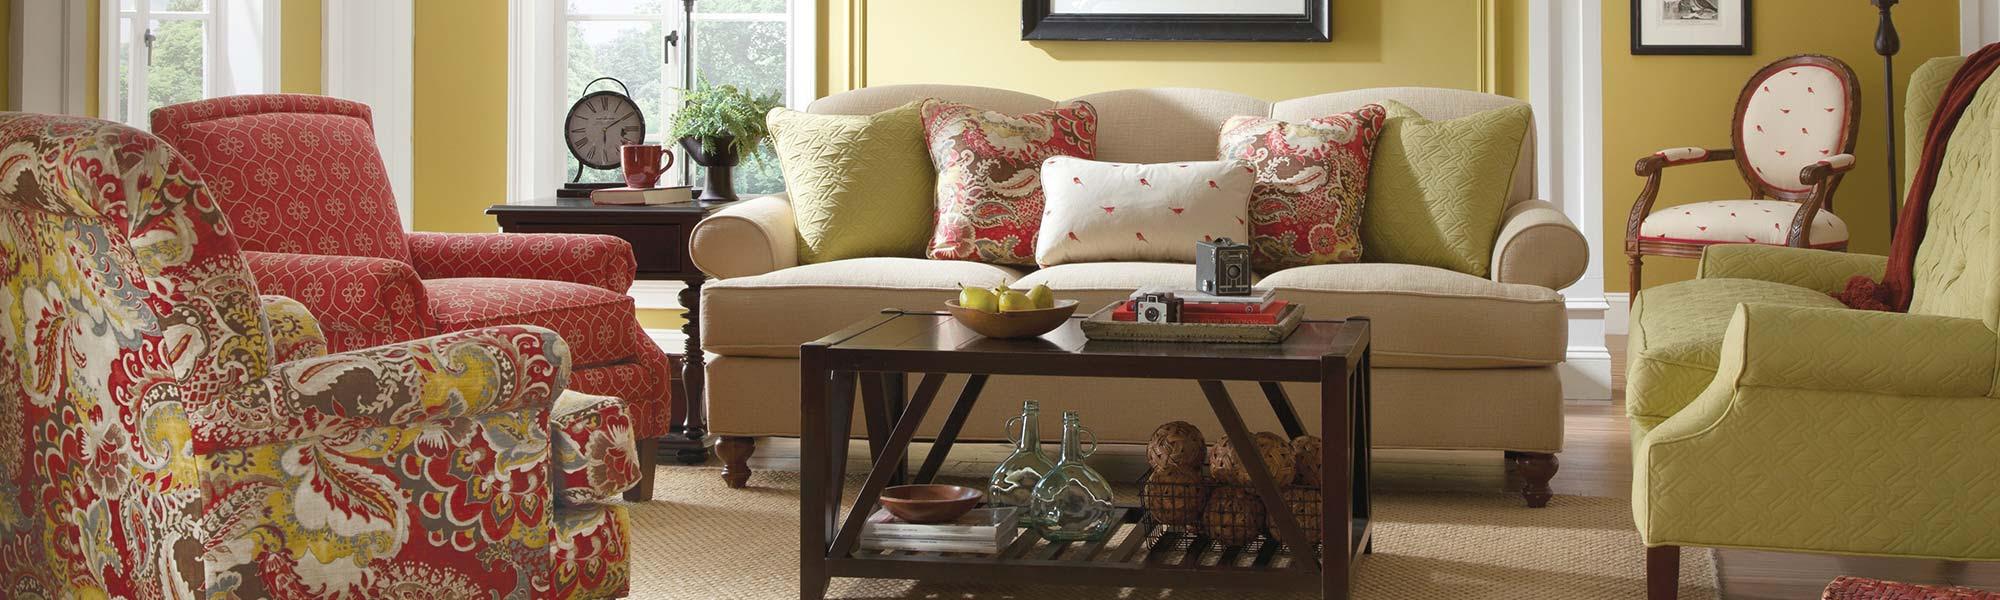 Bedroom Office Furniture In Warner Robins Ga Phillips Furniture